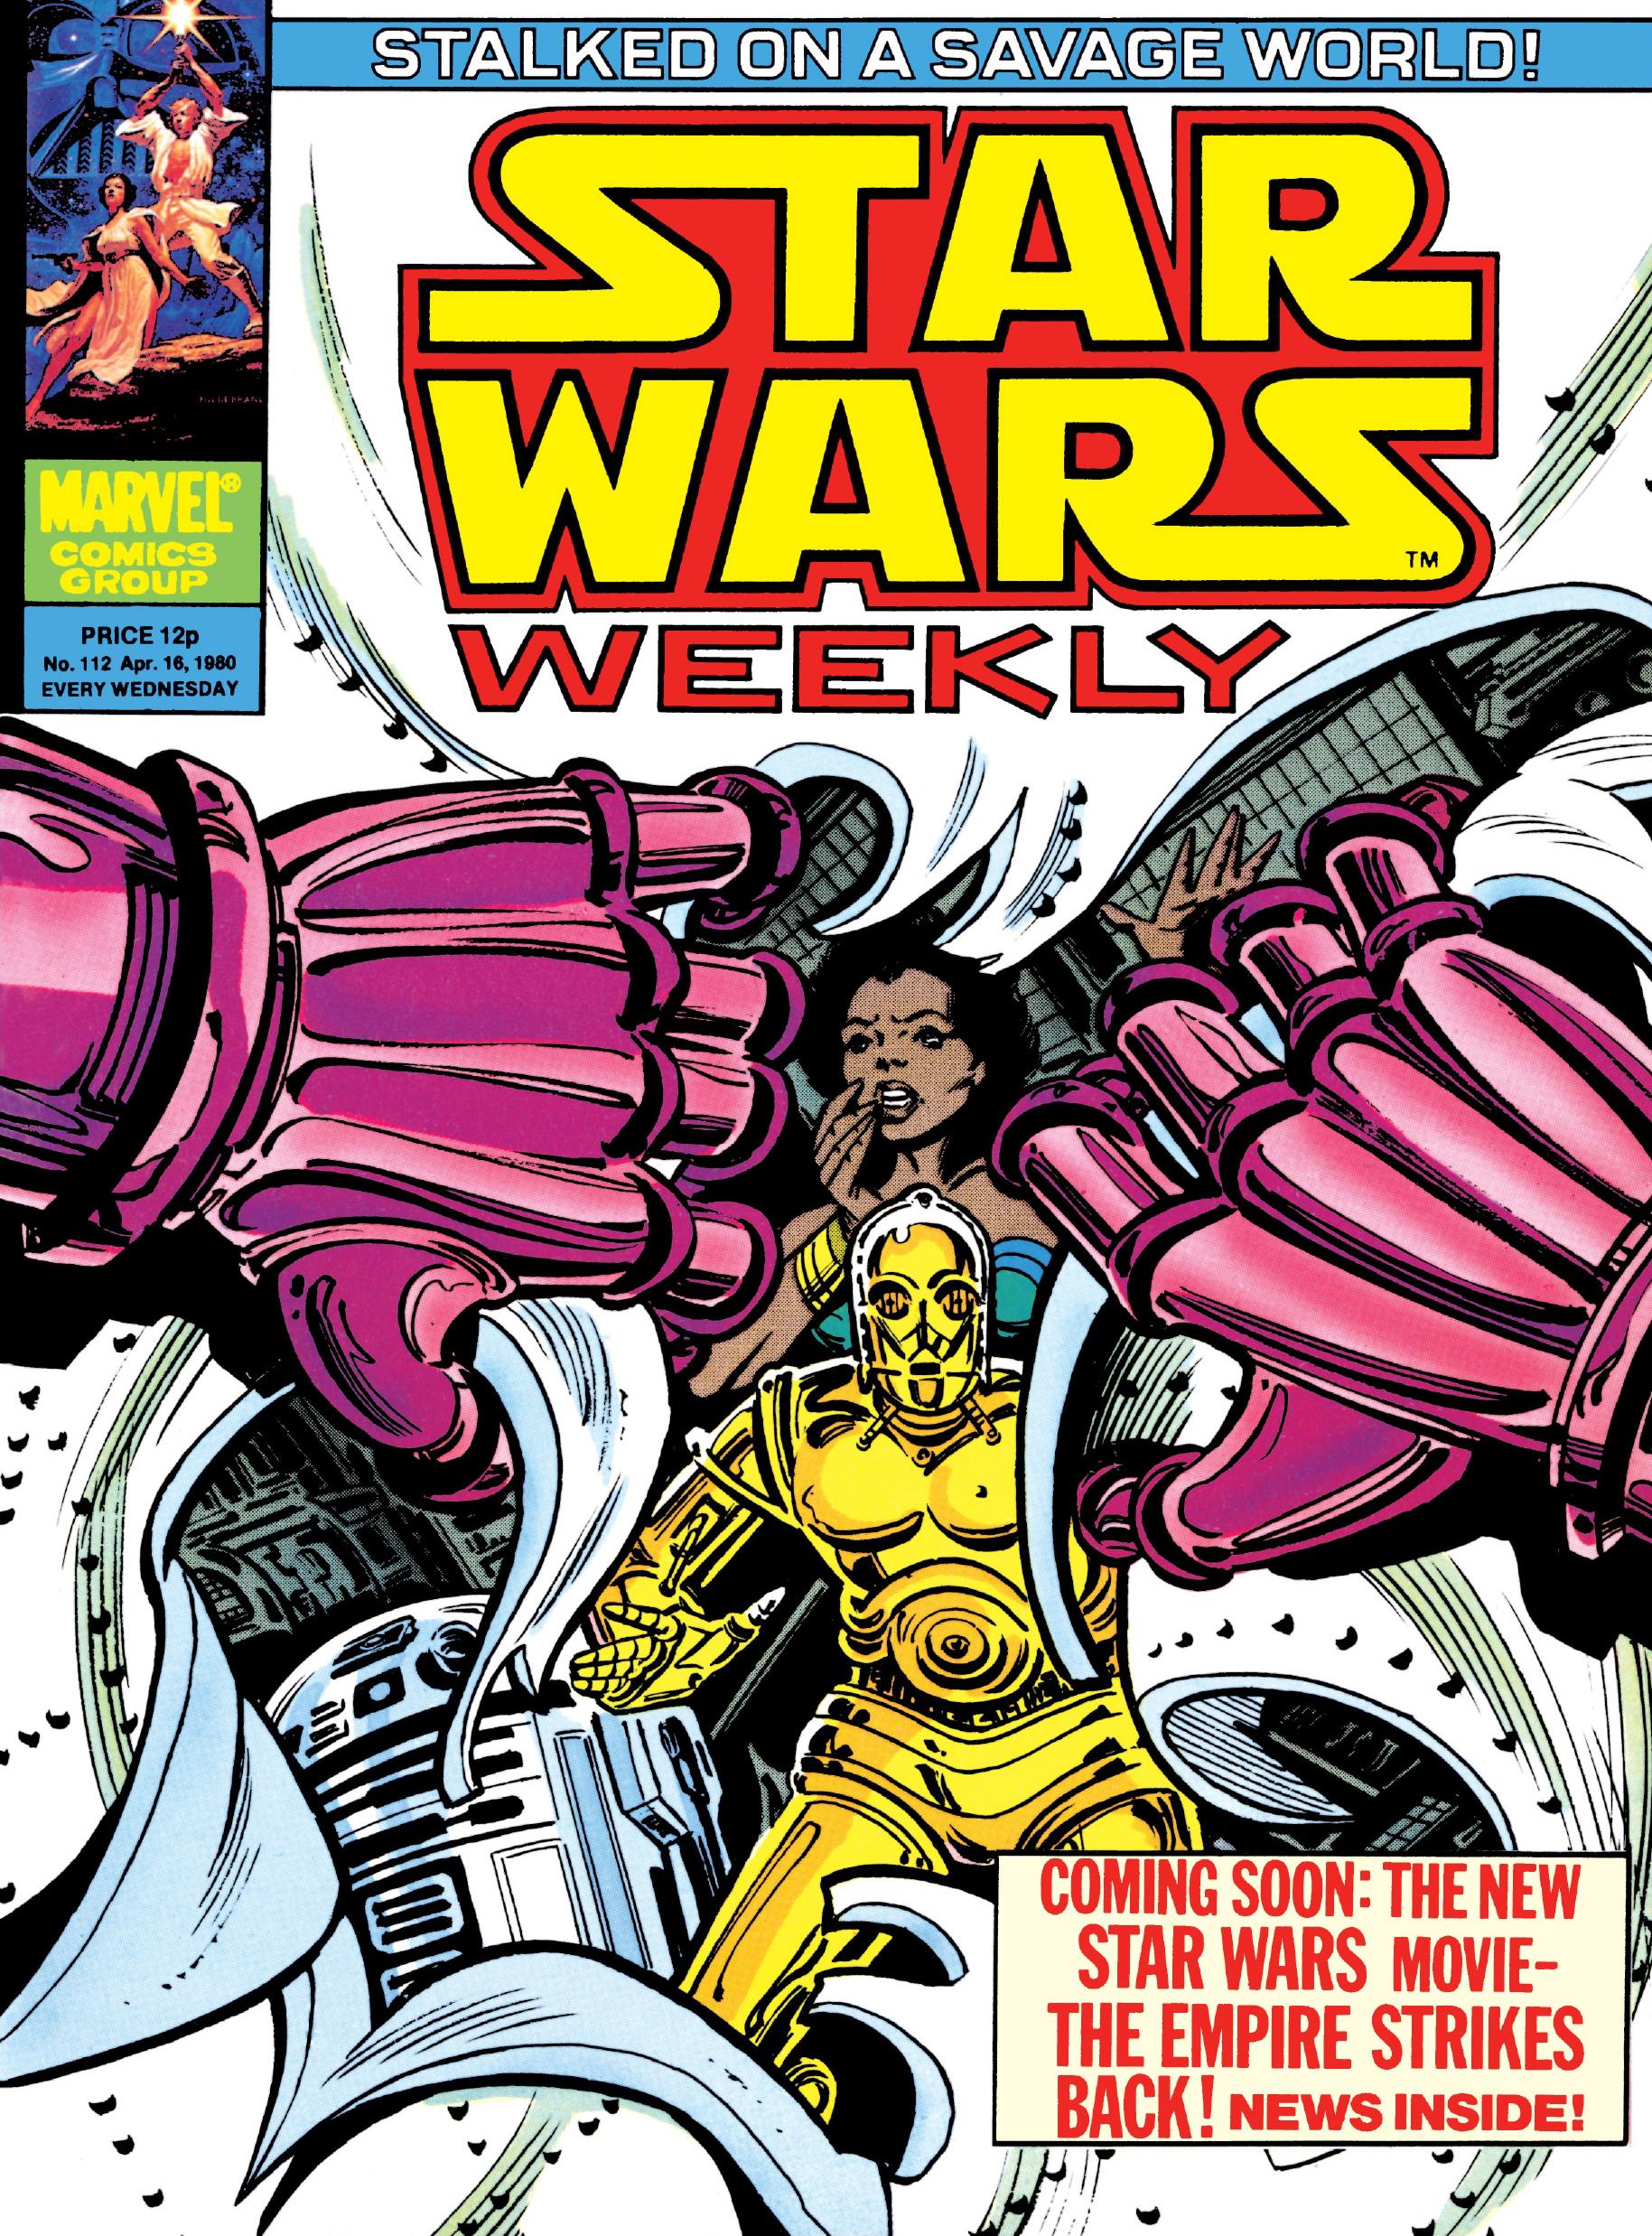 Star Wars Weekly 112